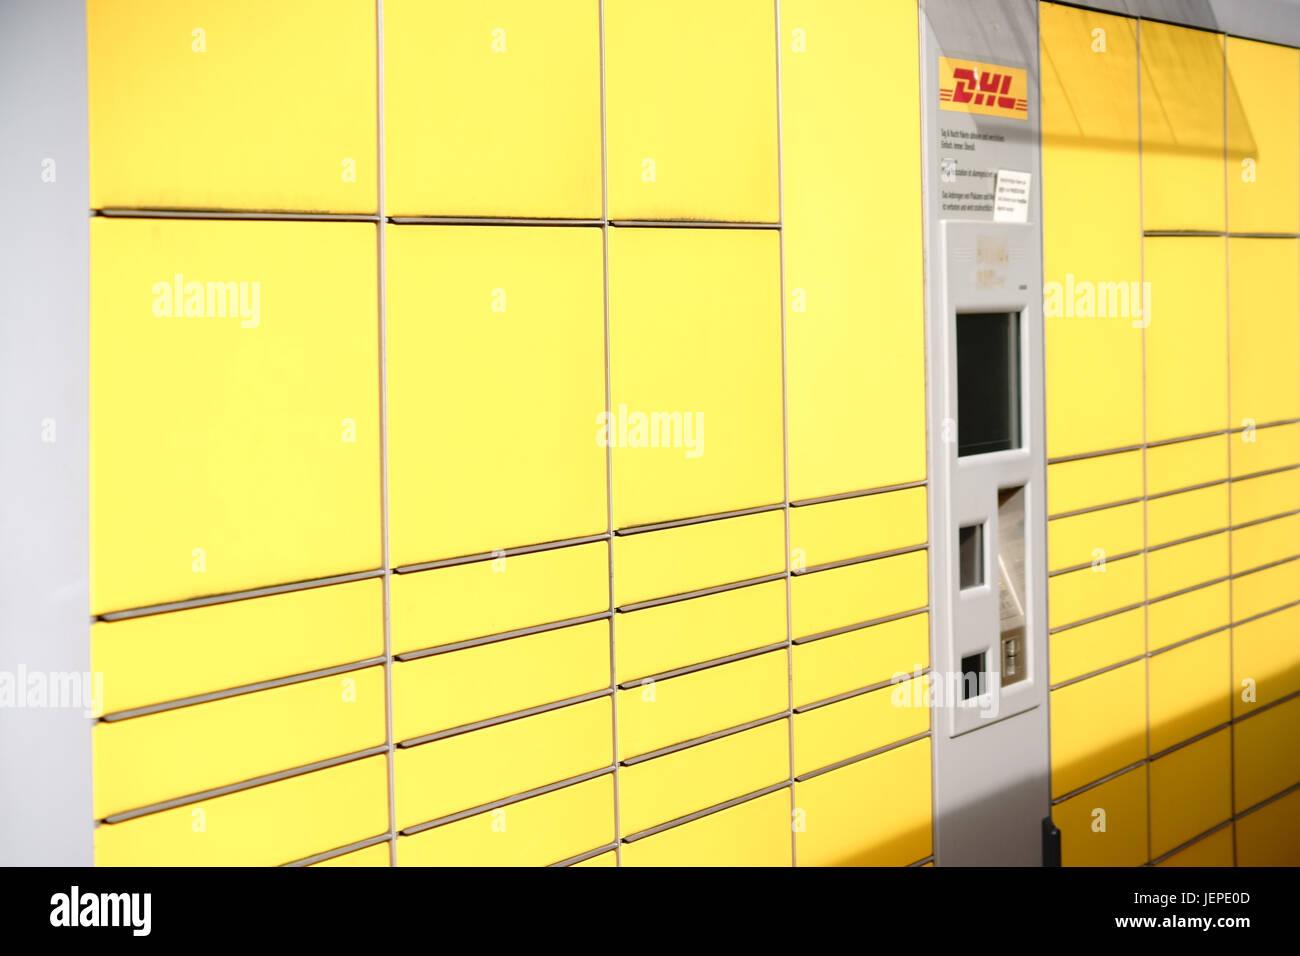 parcel lockers stock photos parcel lockers stock images alamy. Black Bedroom Furniture Sets. Home Design Ideas